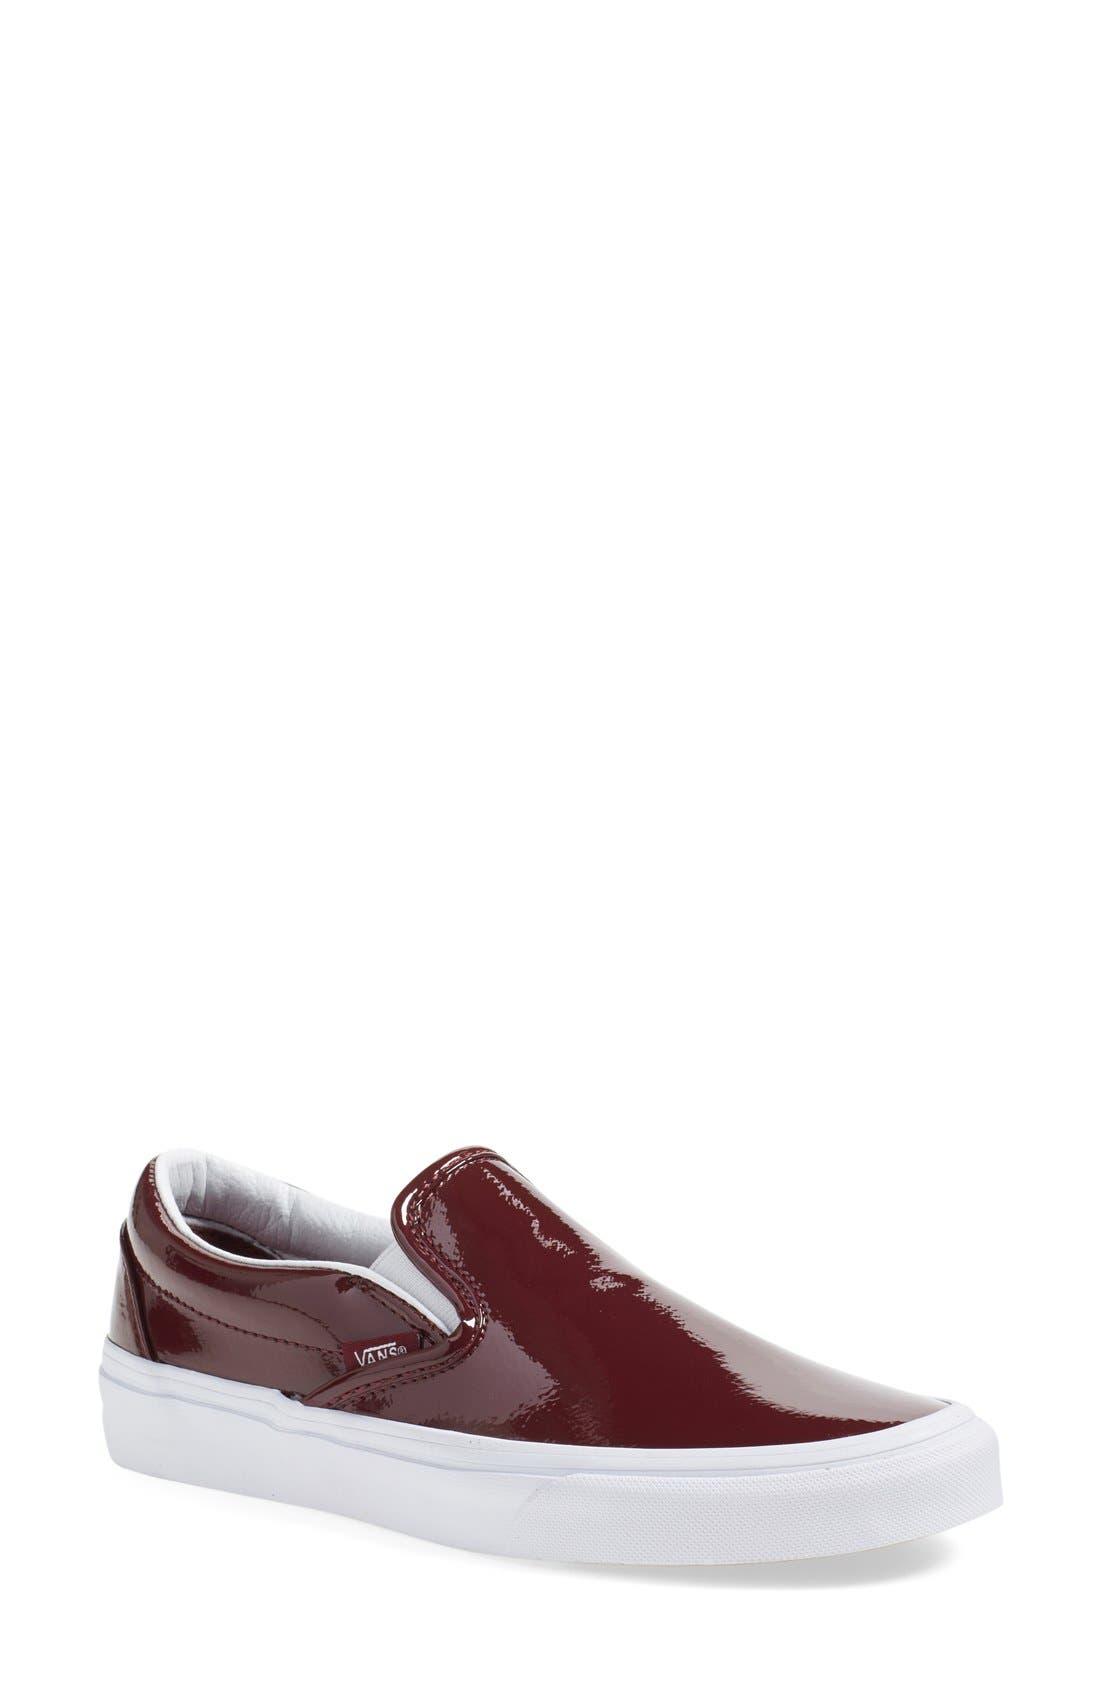 ,                             Classic Slip-On Sneaker,                             Main thumbnail 447, color,                             930